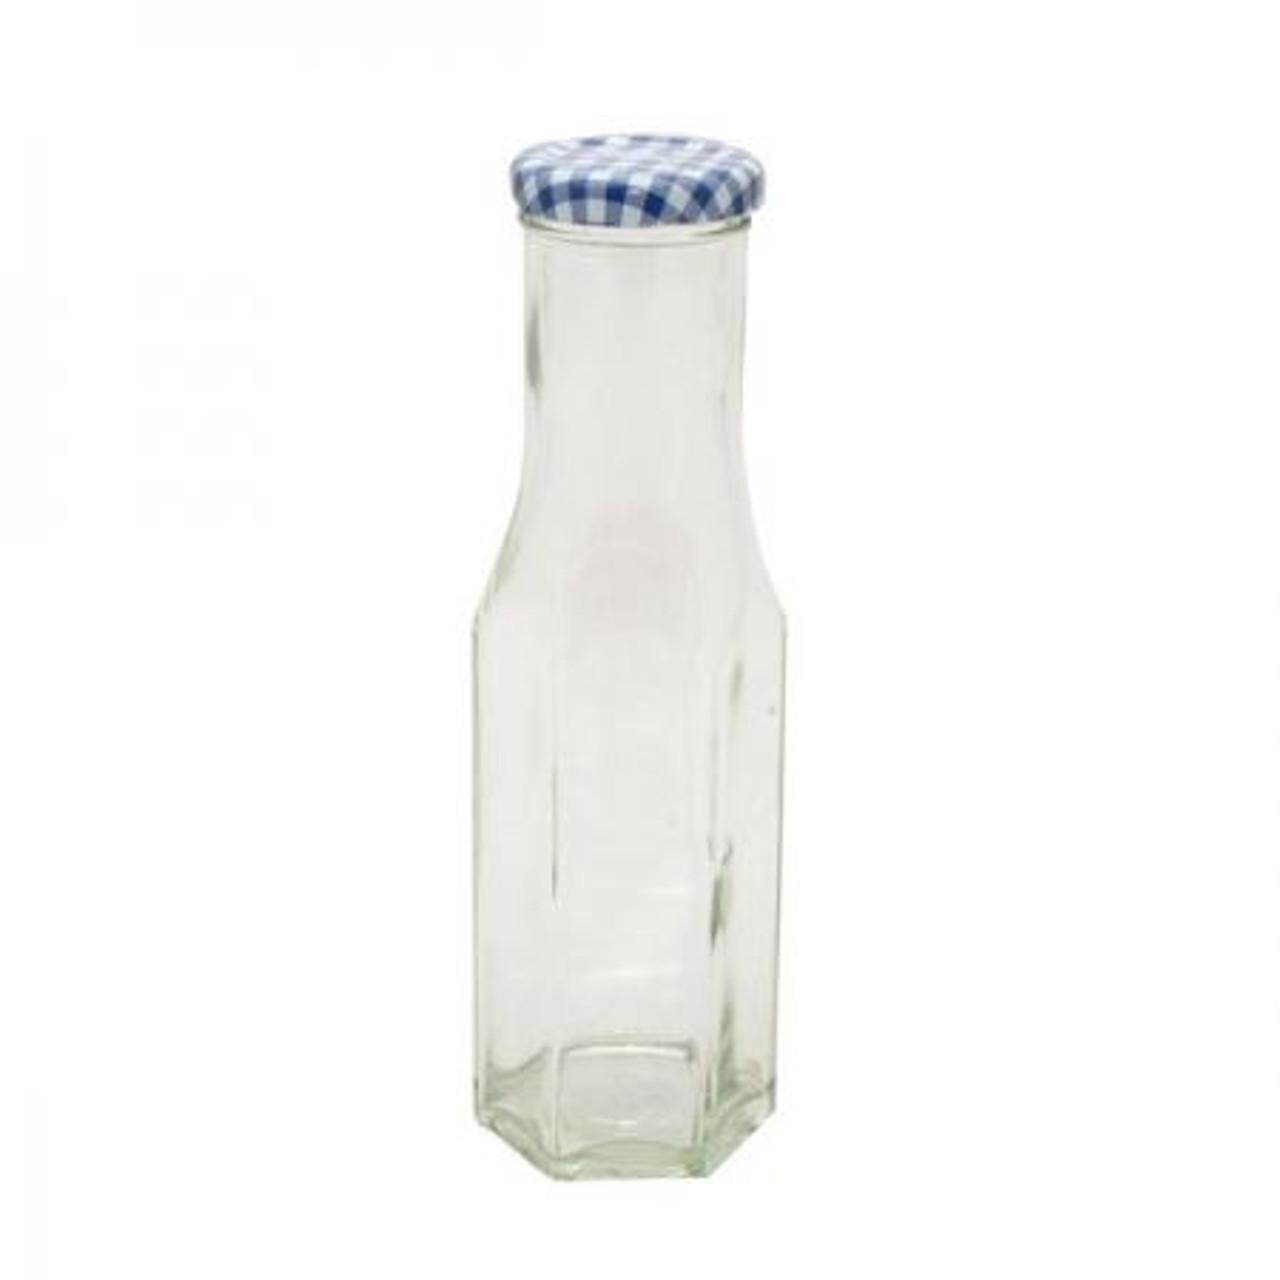 Kilner Hexagonal Twist Top Bottle 250ml